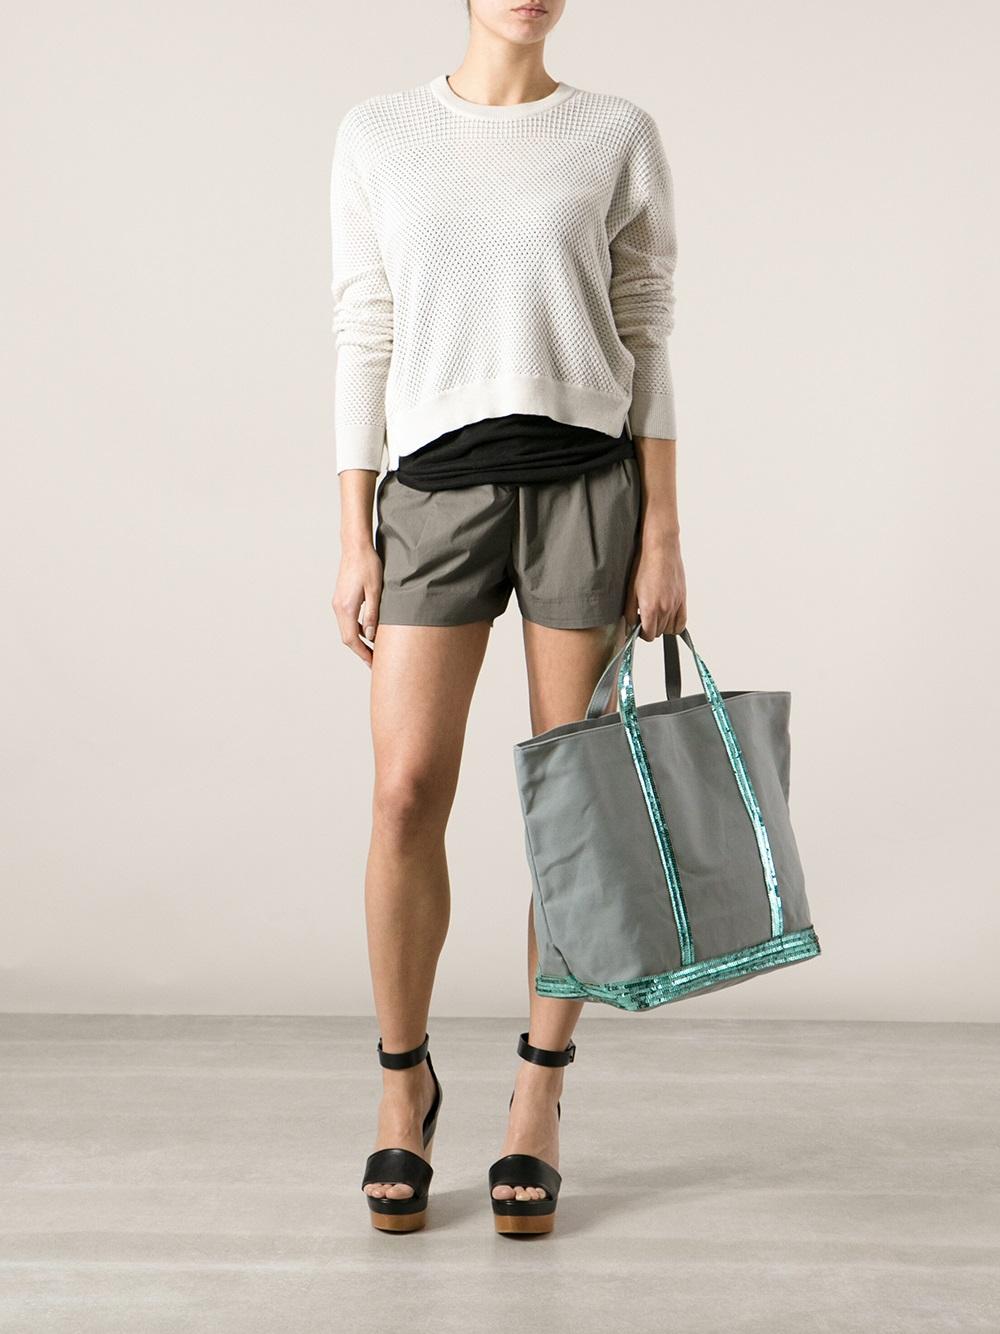 lyst vanessa bruno cabas large shopper in gray. Black Bedroom Furniture Sets. Home Design Ideas